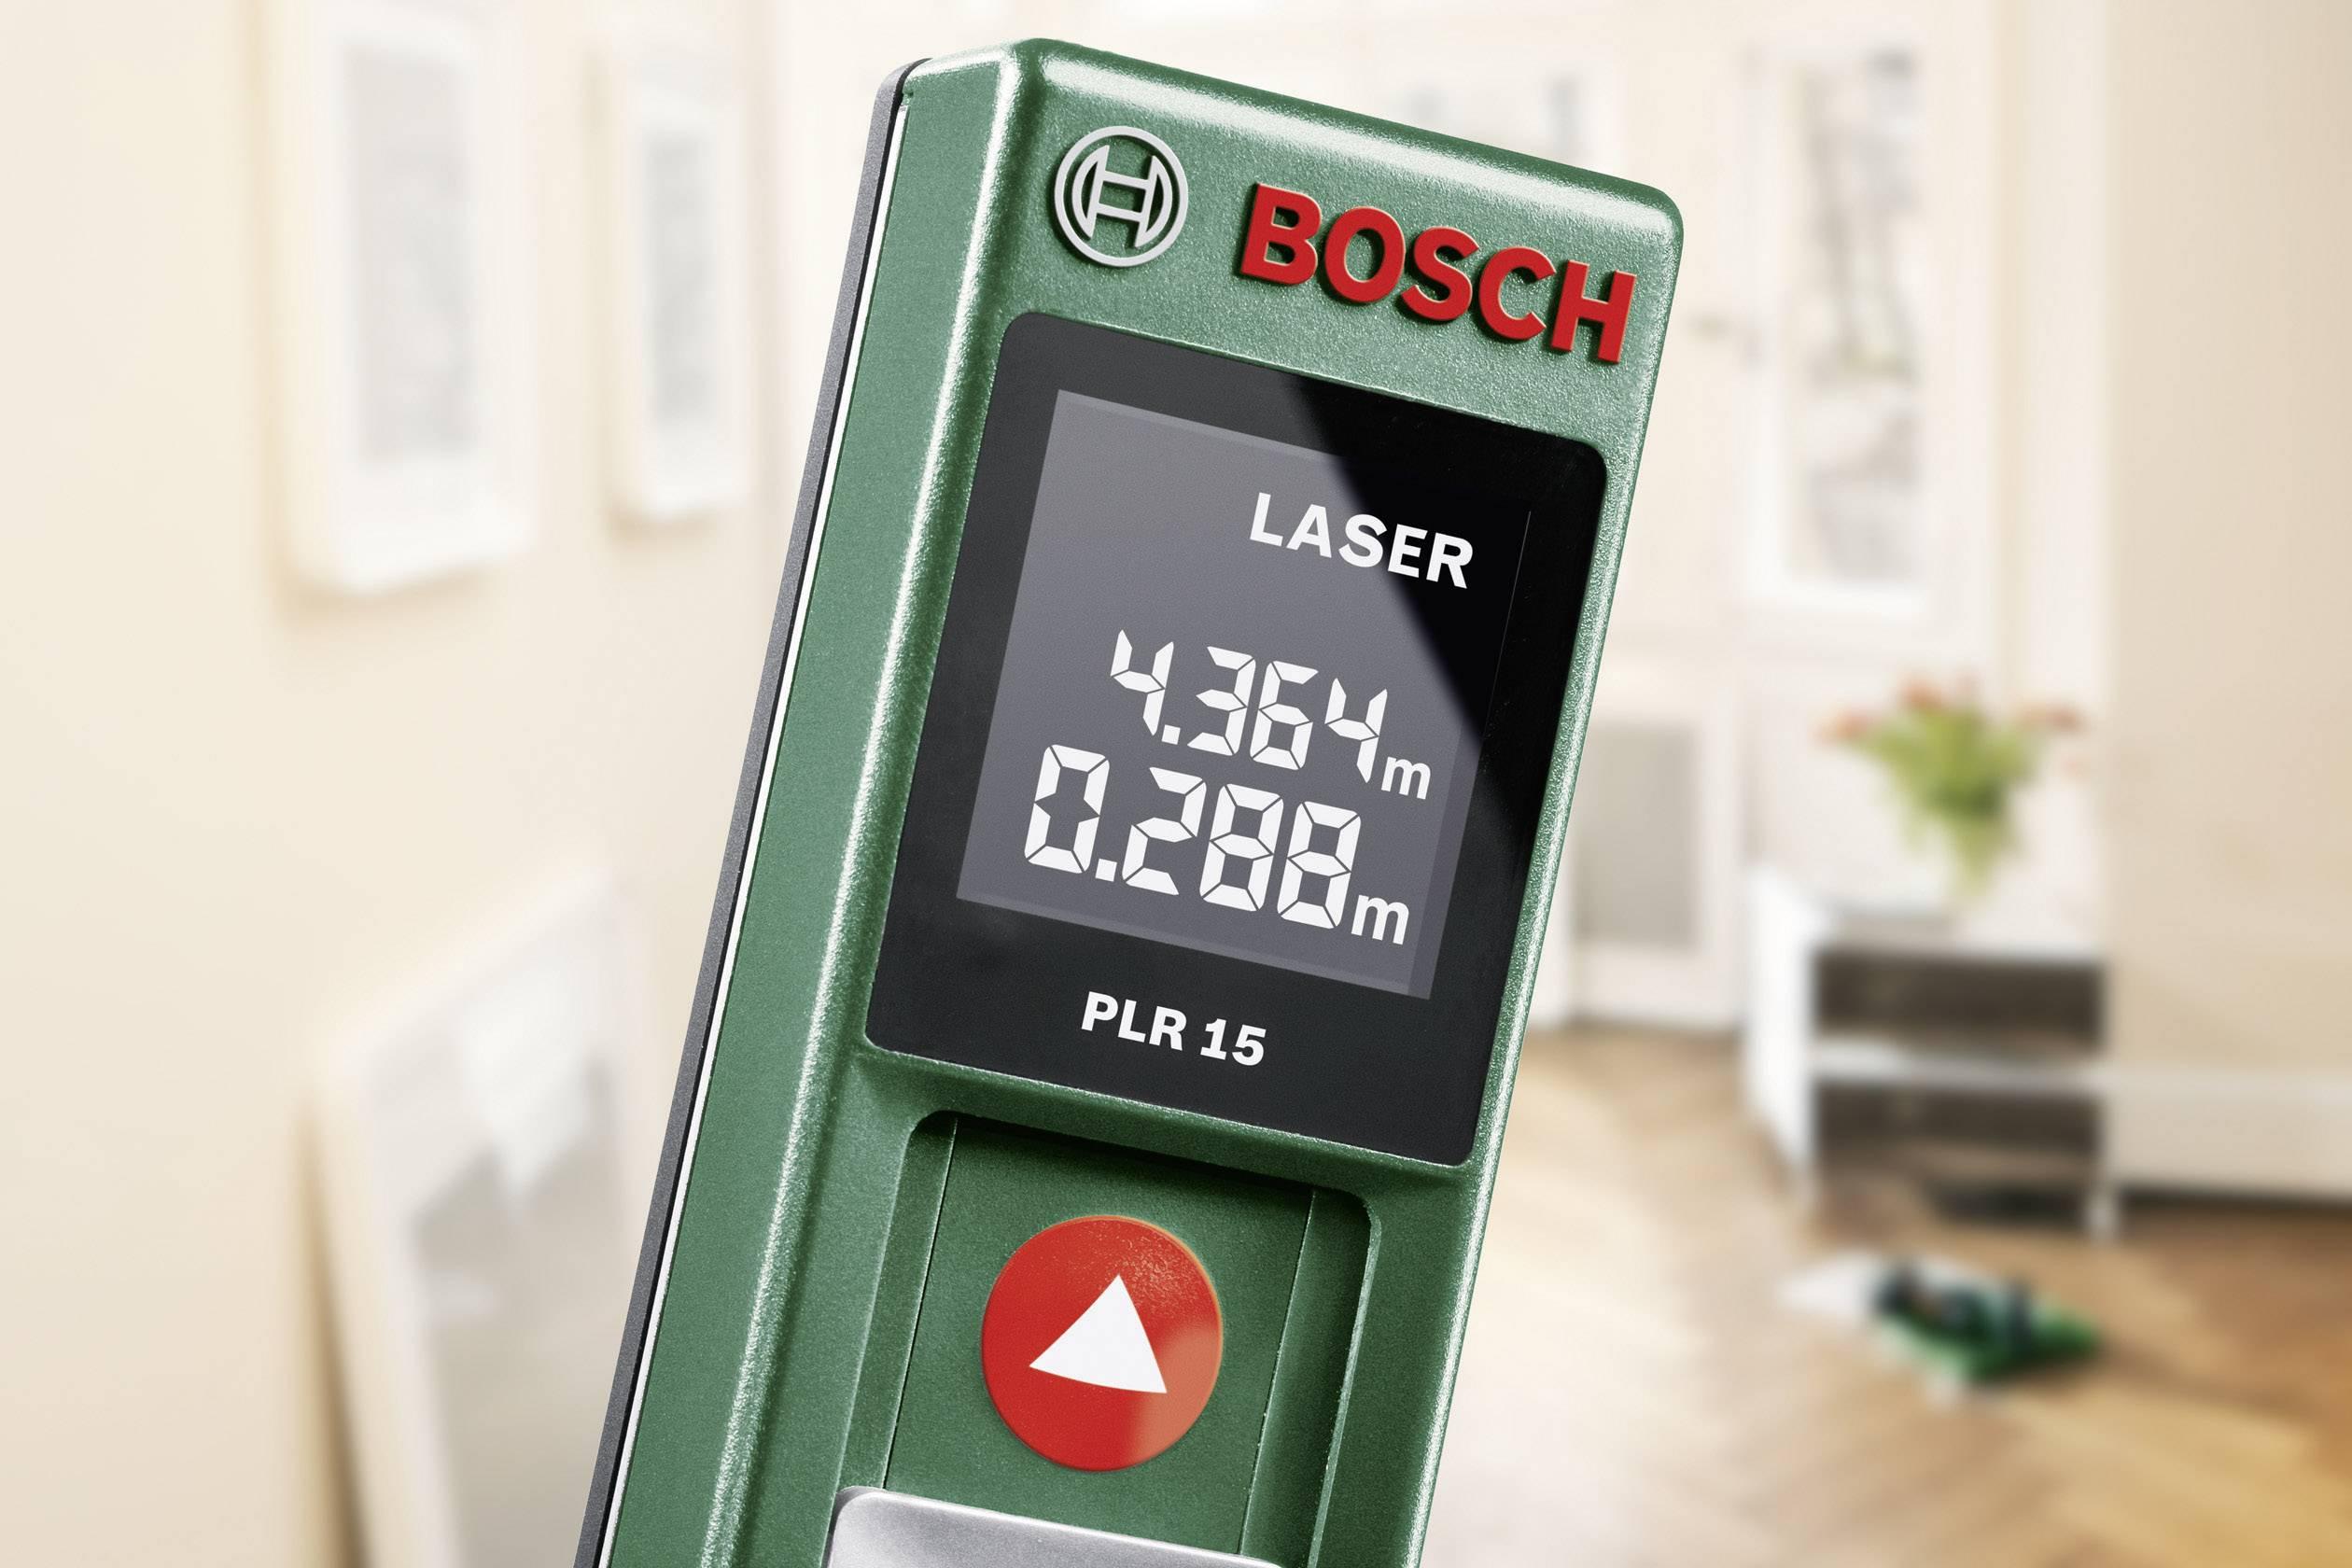 Laser Entfernungsmesser Optisch : Bosch home and garden plr laser entfernungsmesser inkl